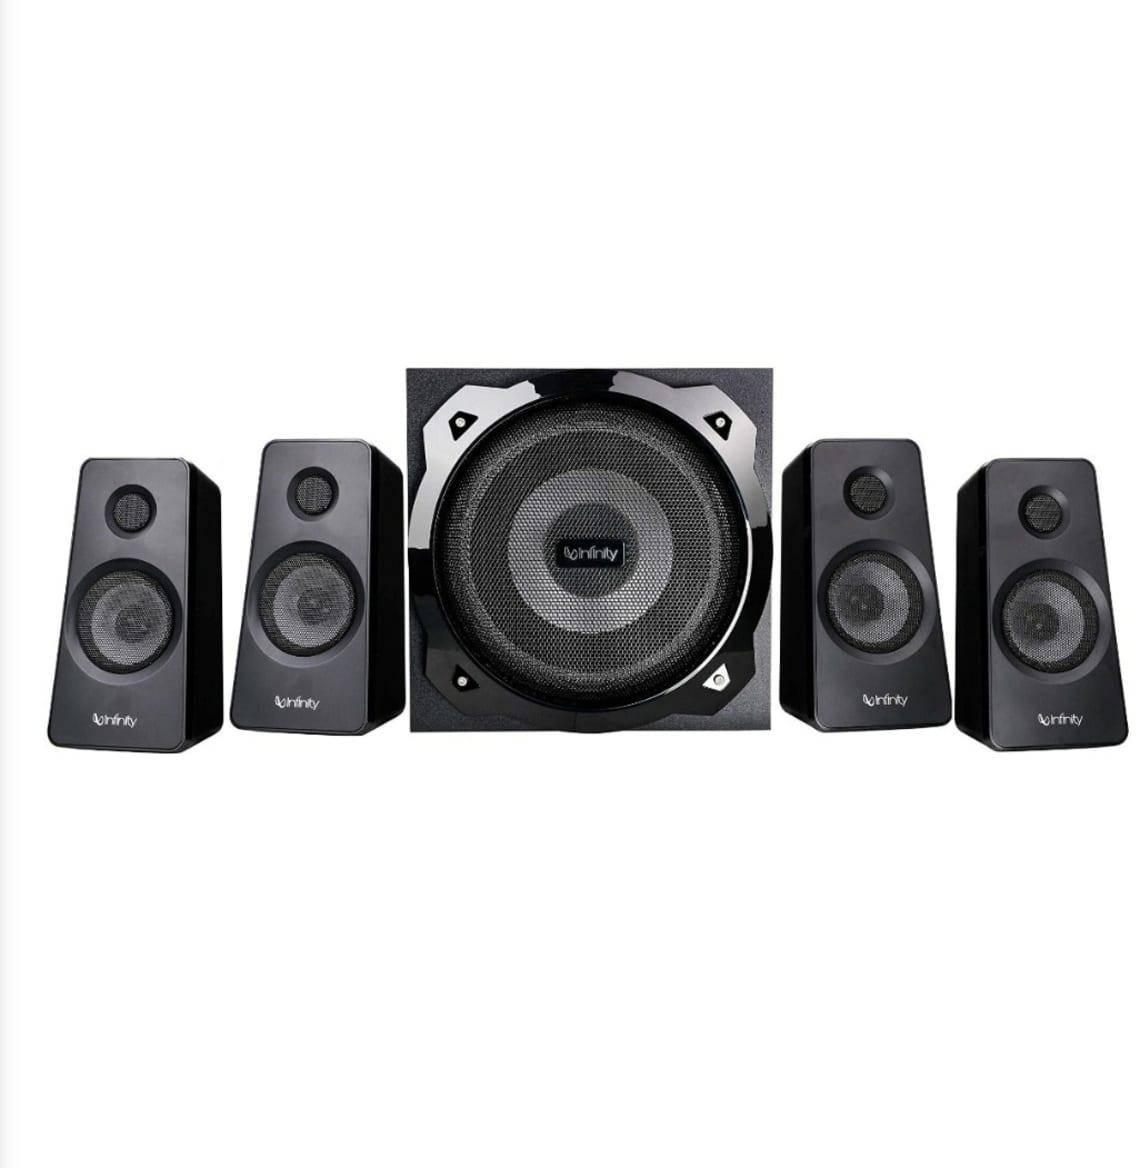 Infinity (JBL) Octabass 410 Deep Bass 4.1 Channel Multimedia Speakers (INFOCB410) zoom image